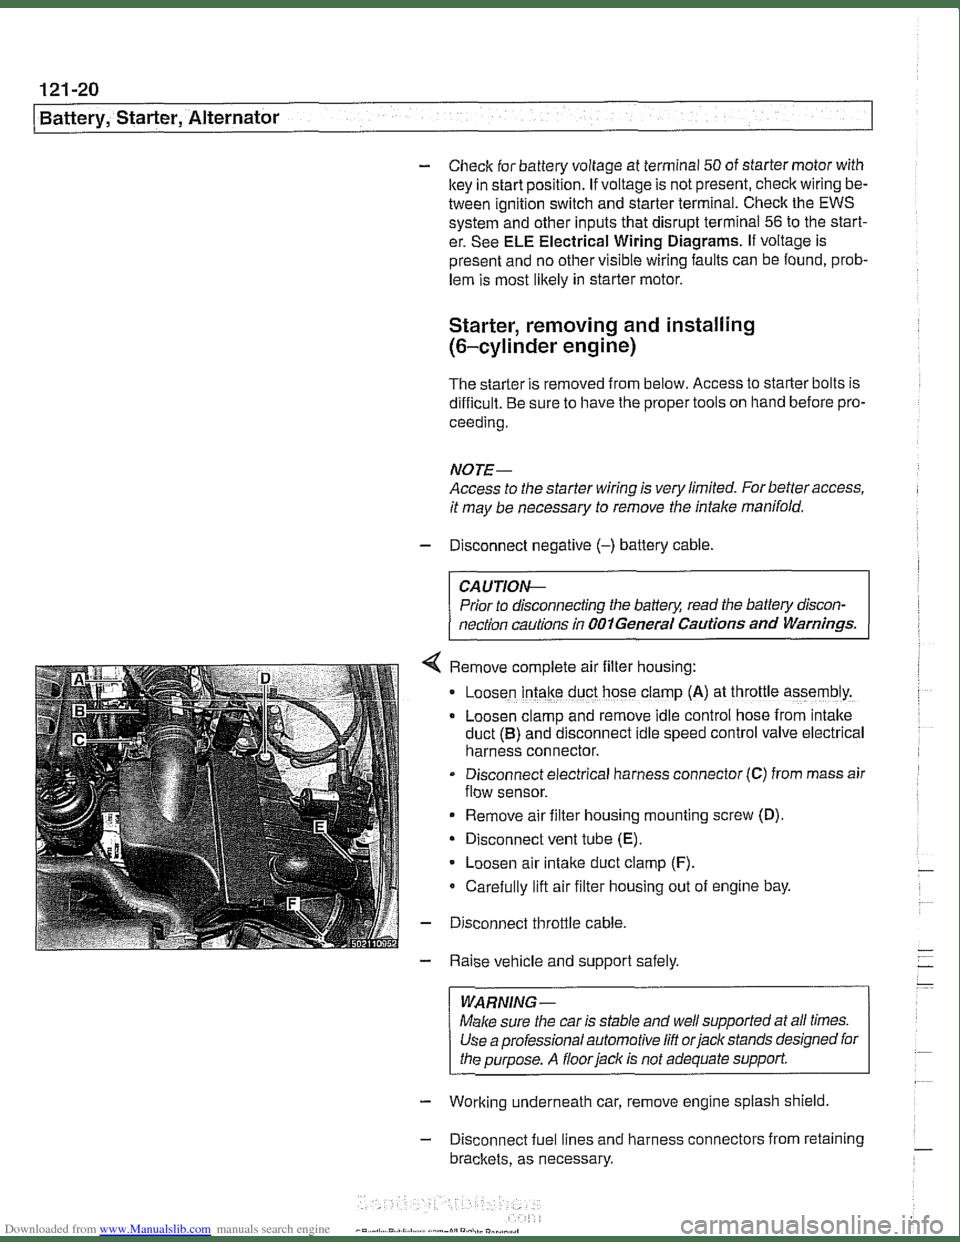 medium resolution of bmw e39 alternator wiring diagram